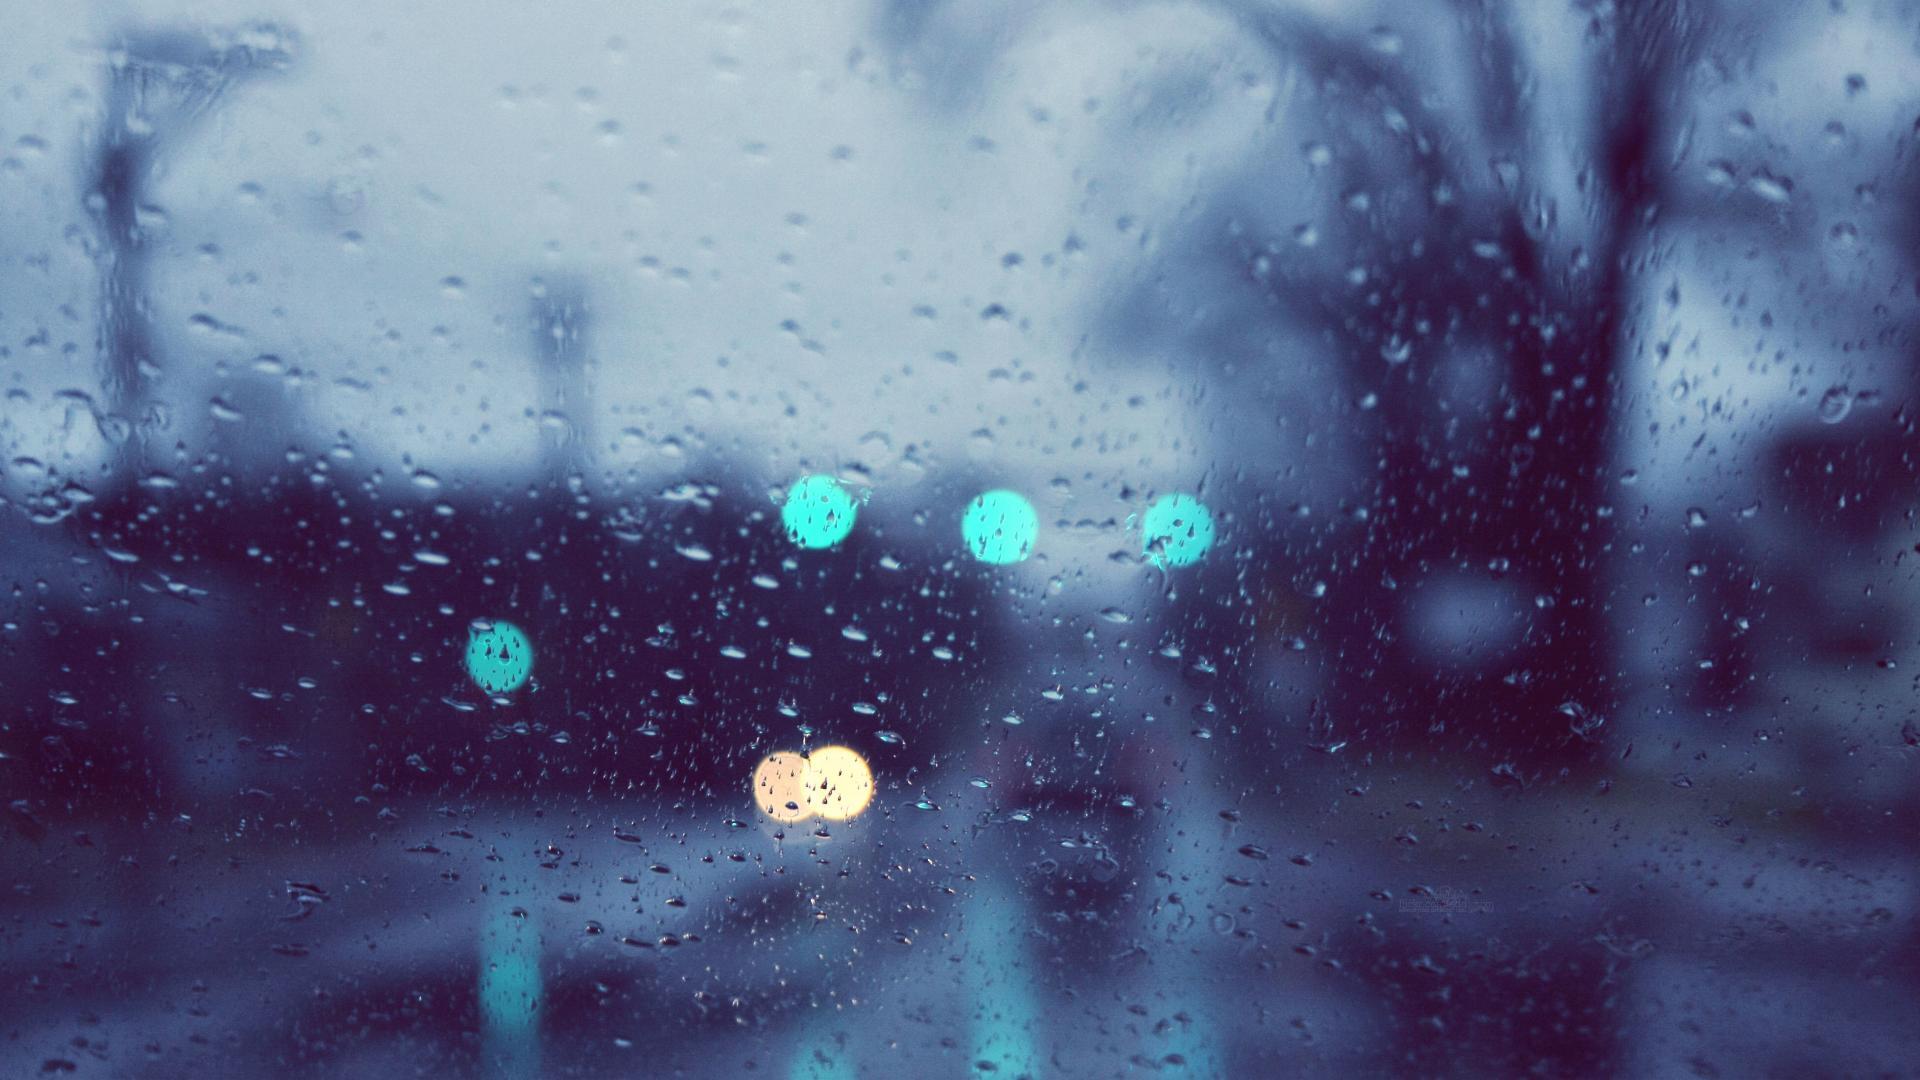 Hd wallpaper rain - Rain Wallpaper Hd Wallpaper 754535